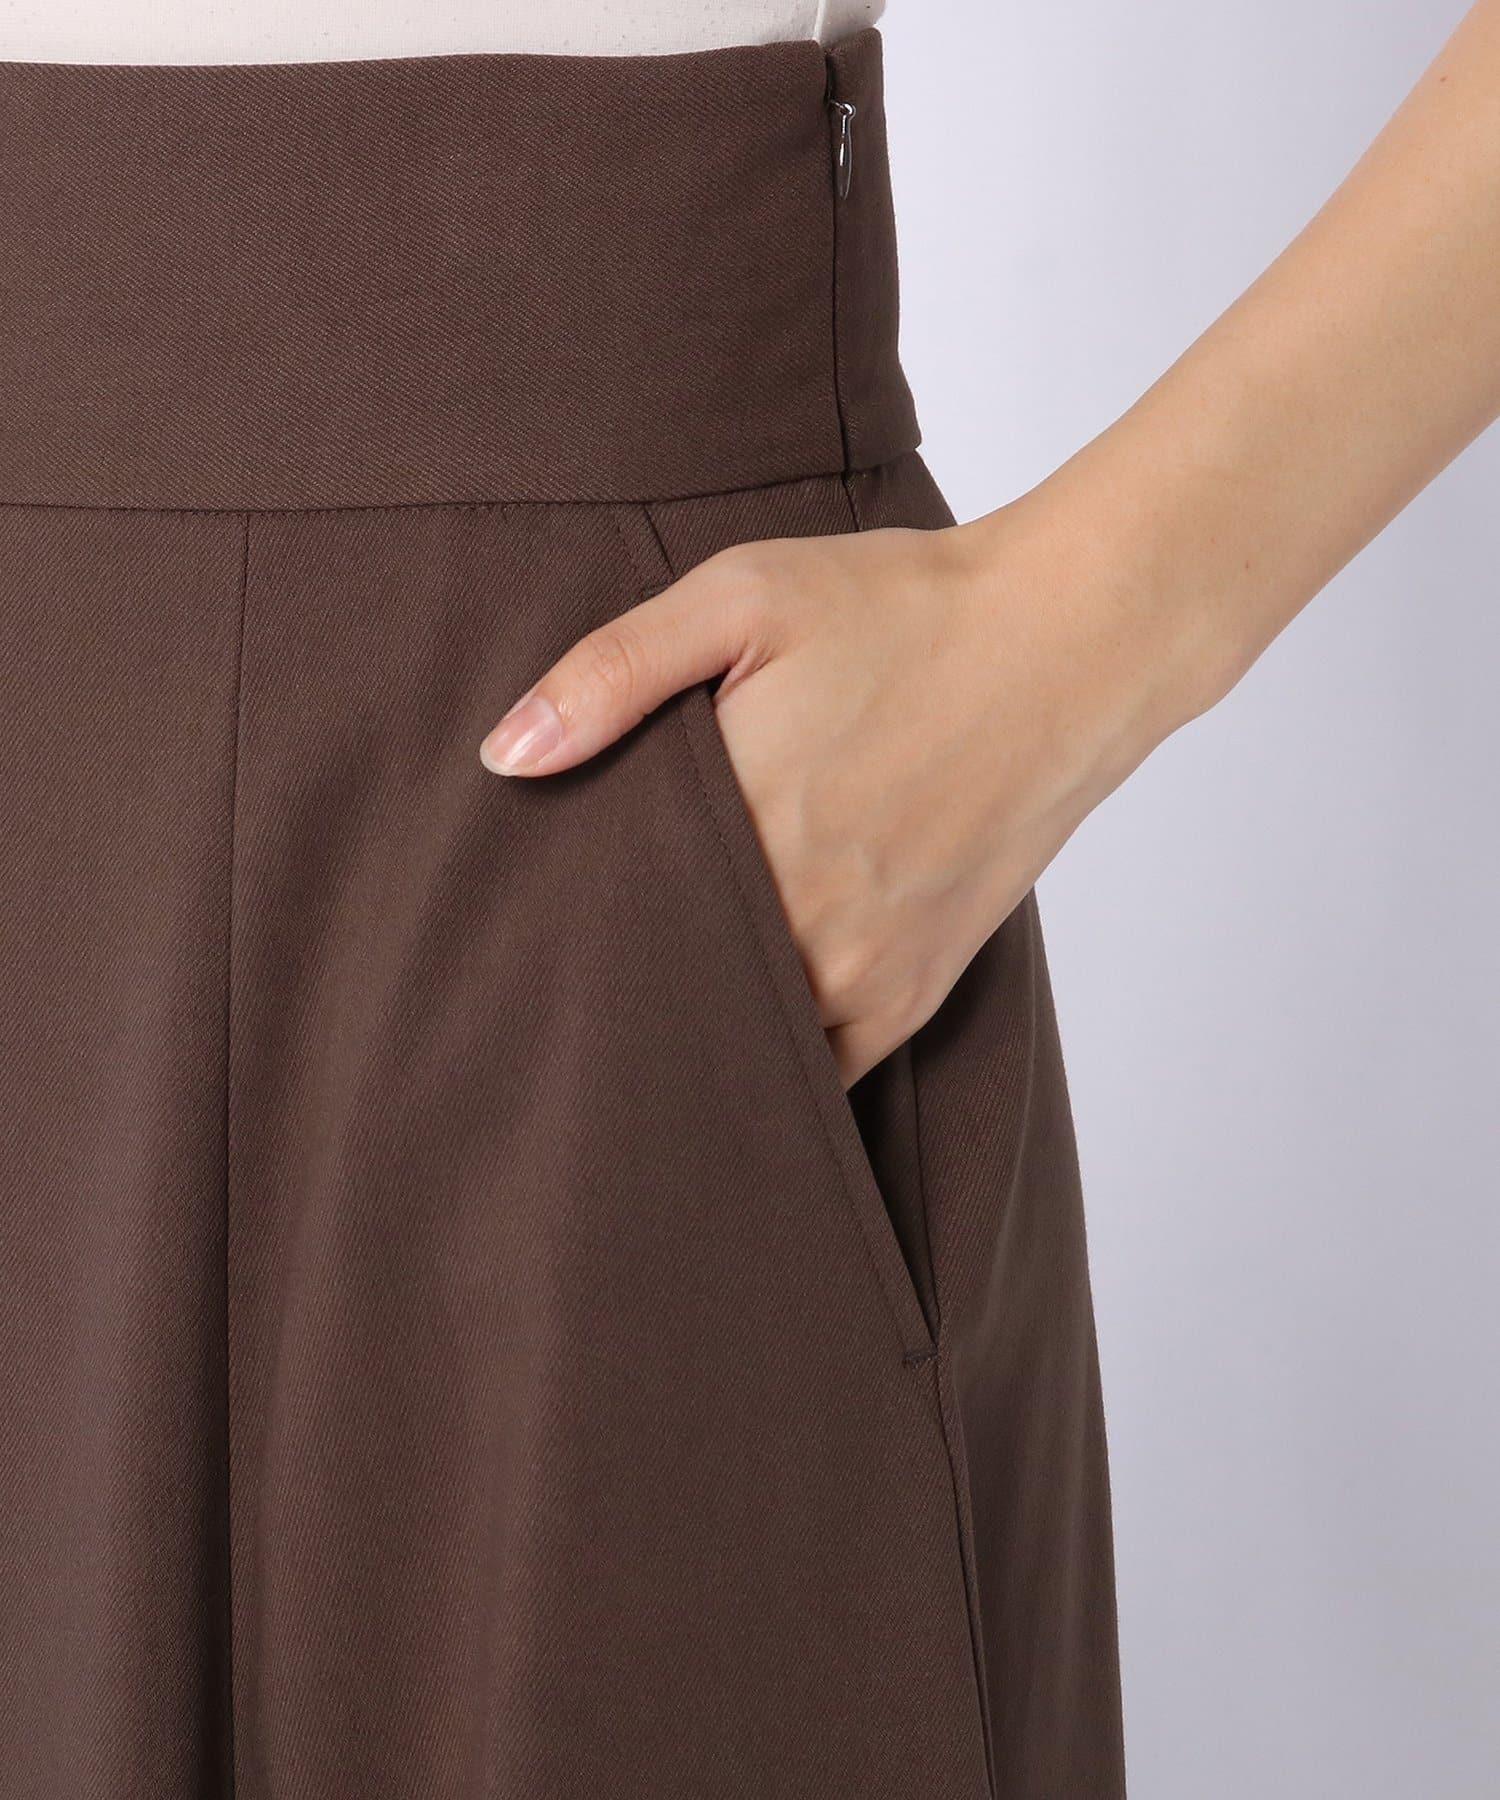 Lui's(ルイス) ワイドベルトフレアスカート